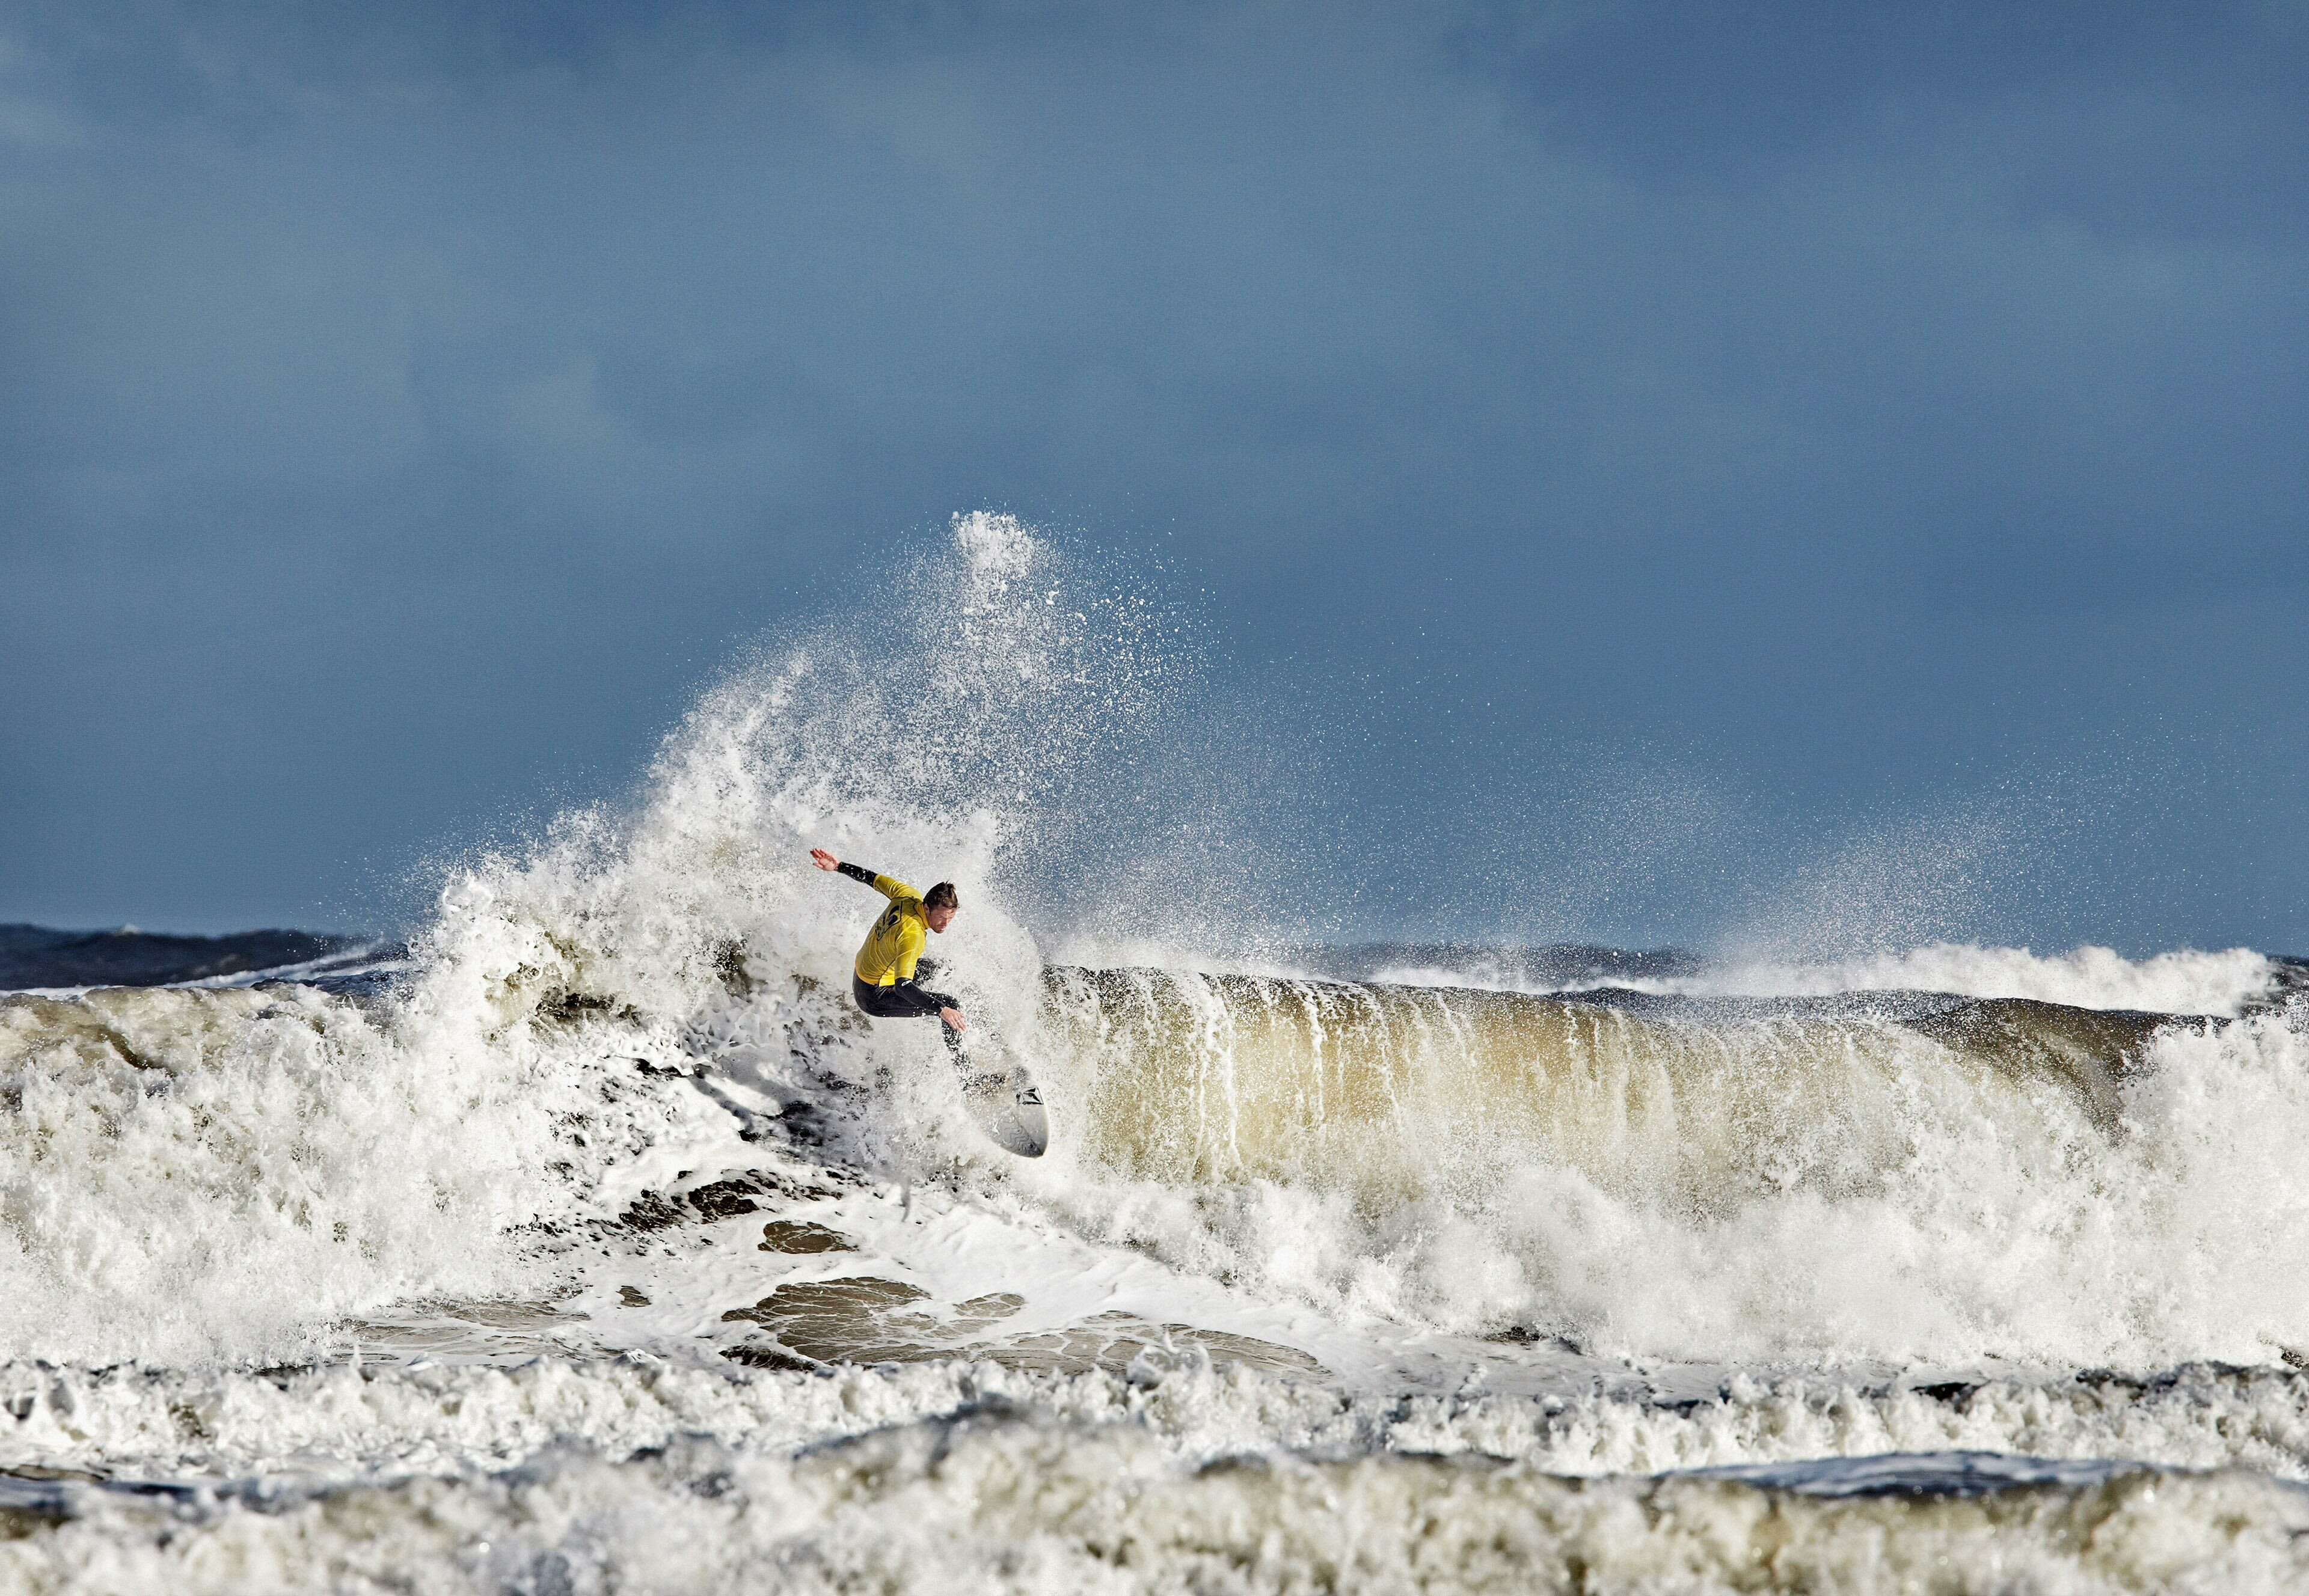 Richard Moran Beech Surf Skate Personal 002